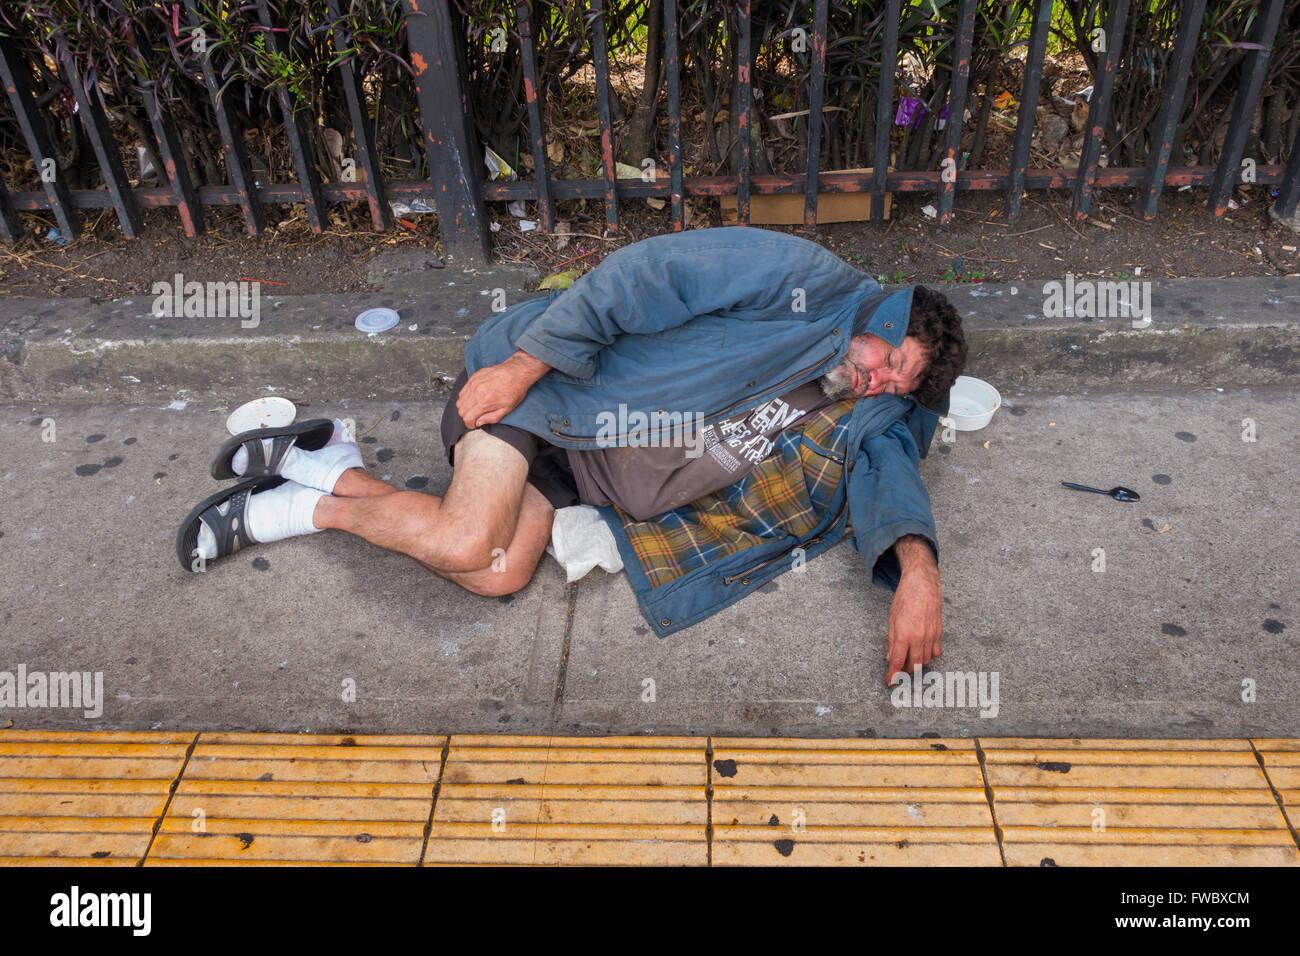 A homeless man sleeping along Avenida 2 in San José, San José Province, Costa Rica. - Stock Image